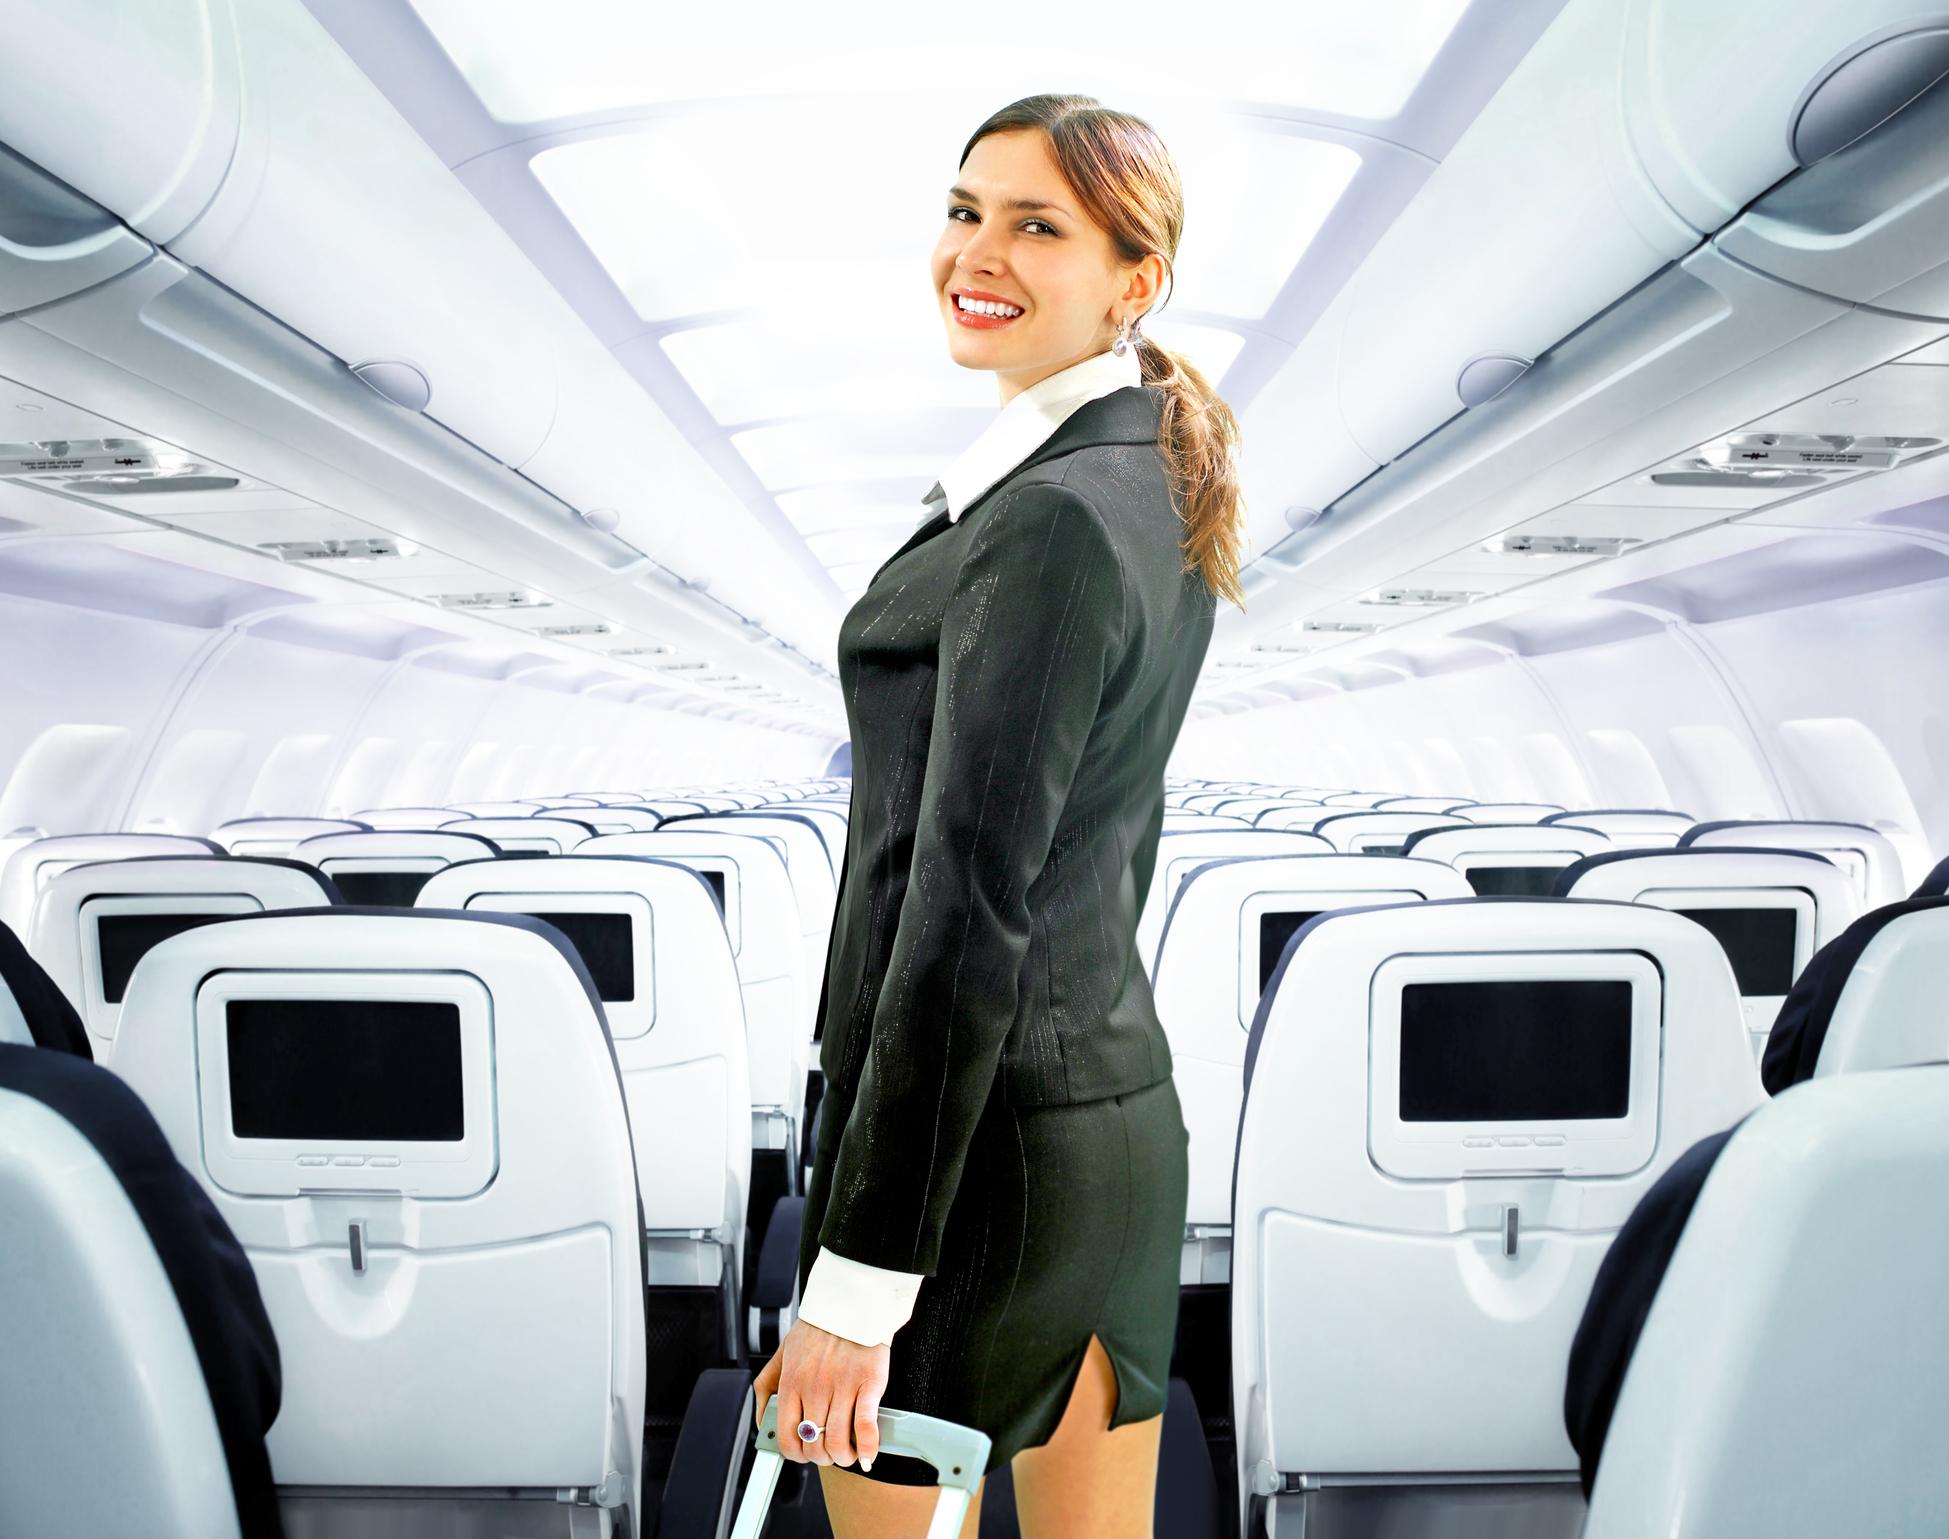 Фото стюардесса ххх, Голые стюардессы - Лучшее фото 7 фотография